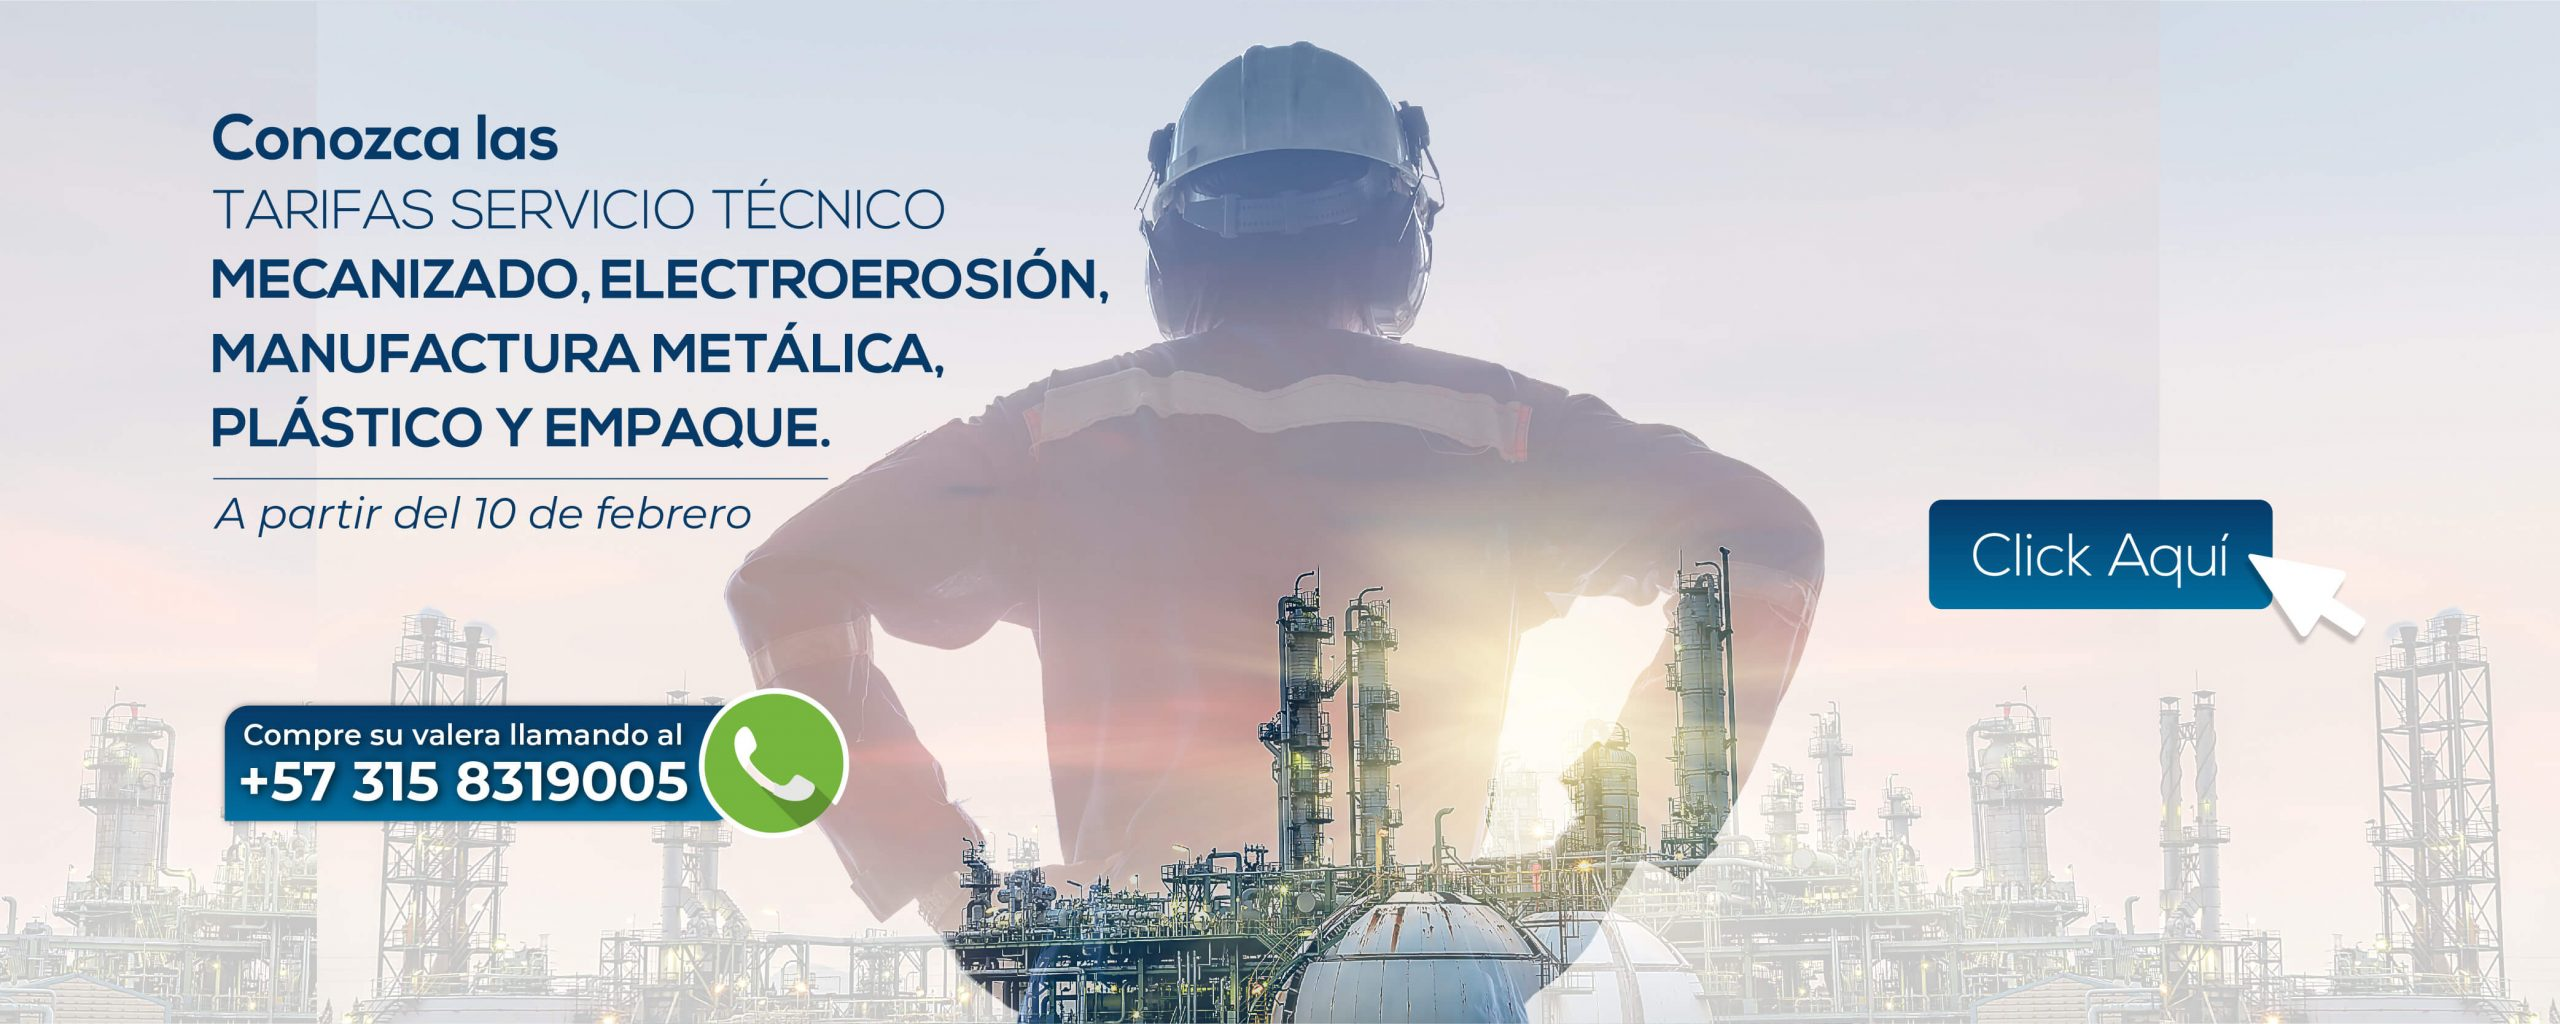 tarifas servicio tecnico IMOCOM 2020